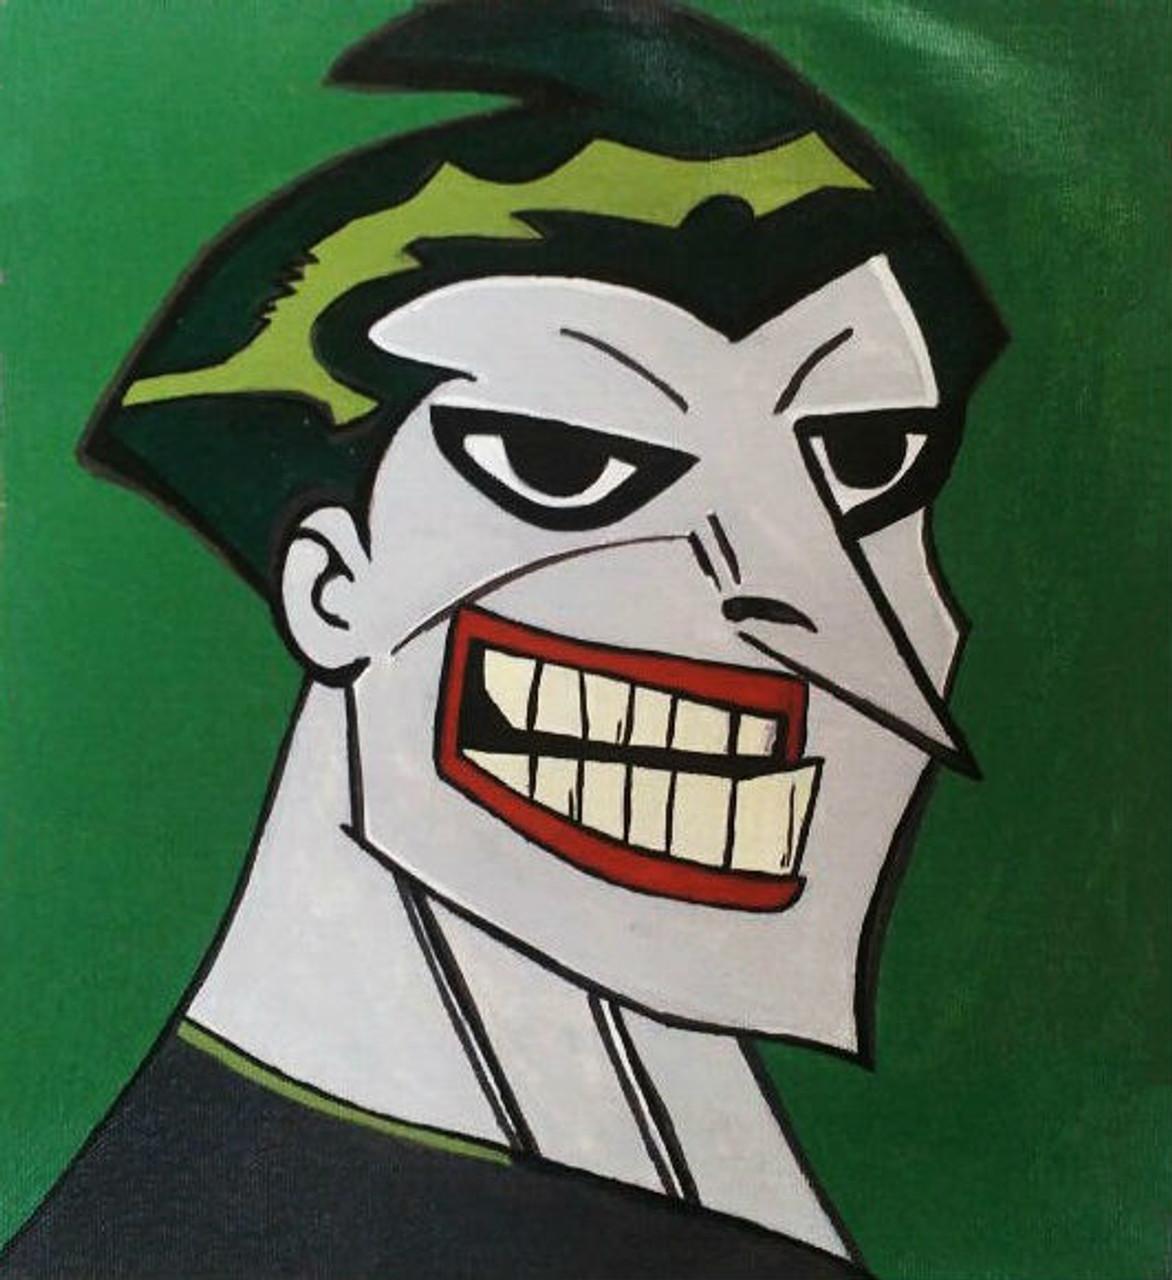 Joker Cartoon Animated Series Art 1755 14391 Handpainted Art Painting 11in X 12in